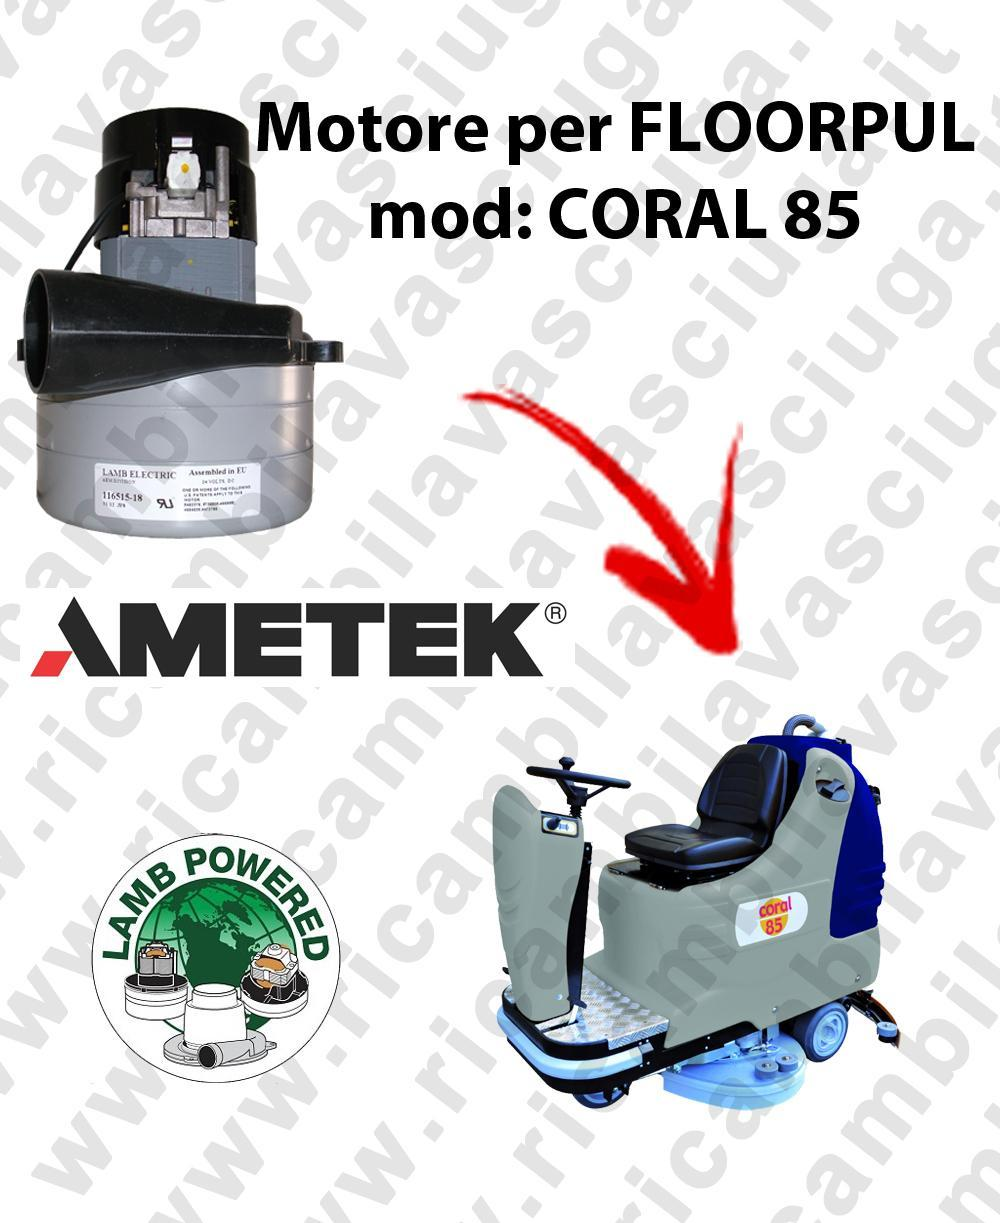 CORAL 85 Motore de aspiración LAMB AMETEK para fregadora FLOORPUL